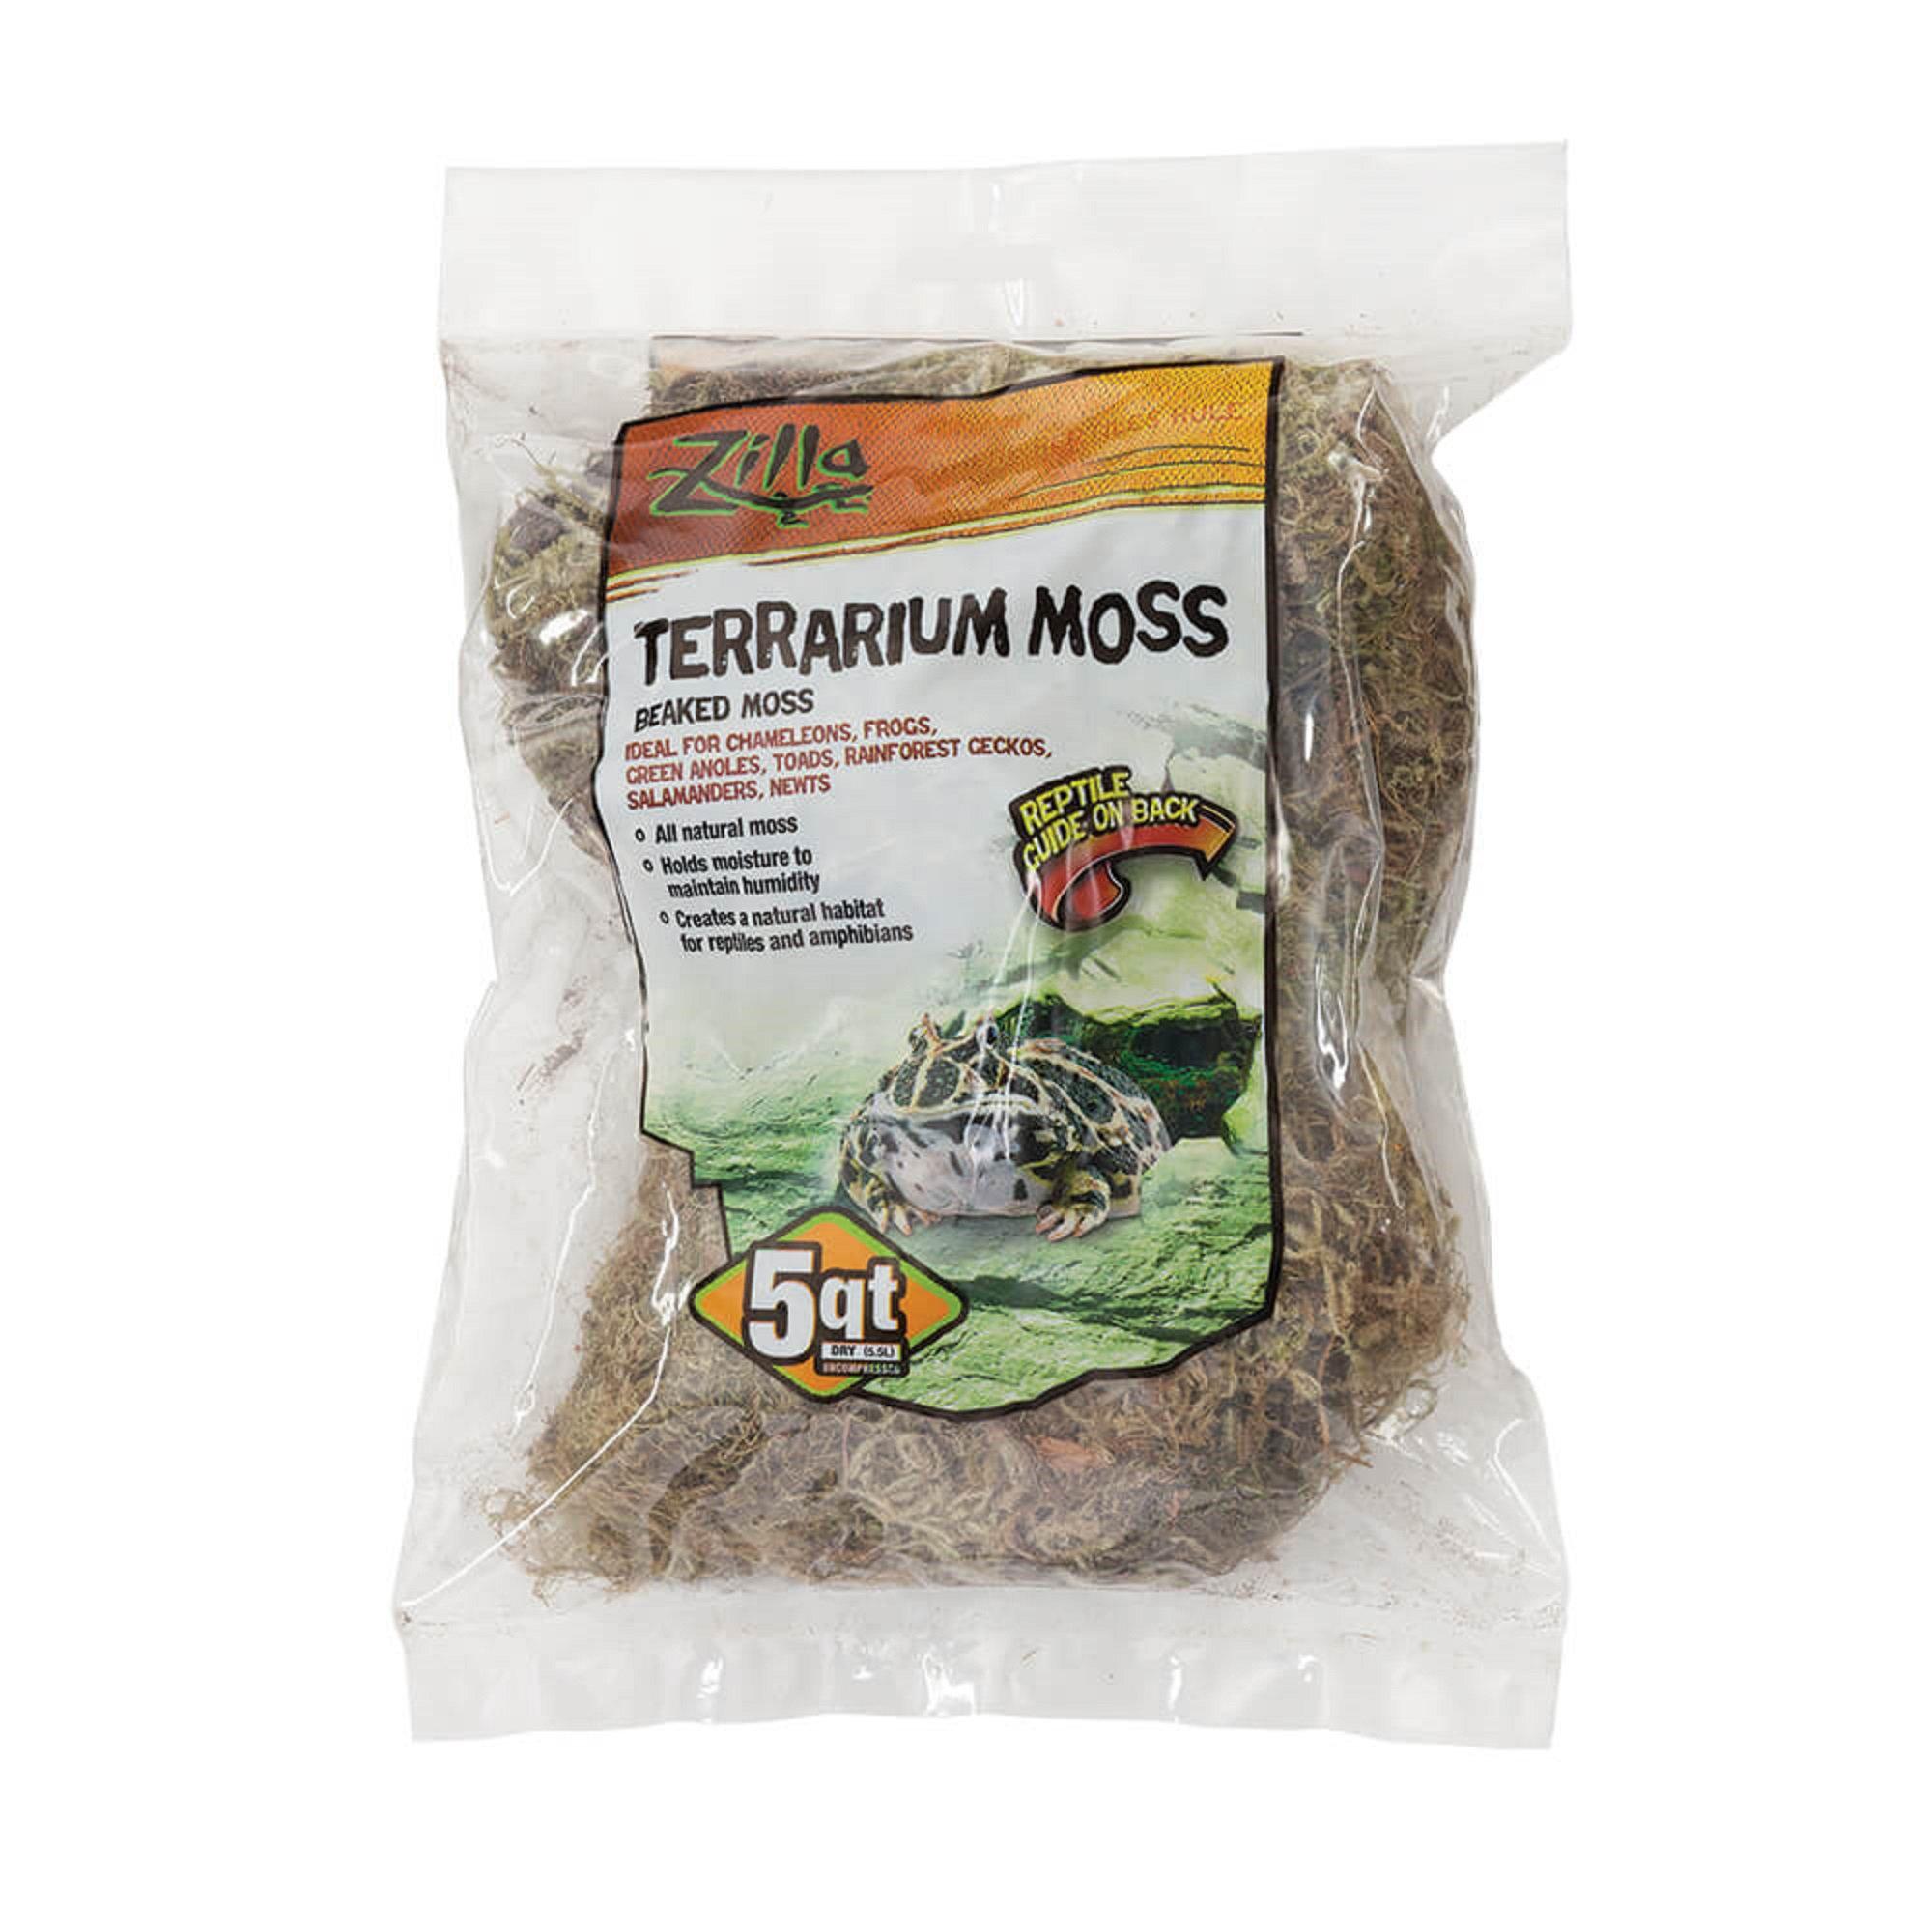 Zilla Beaked Moss Reptile Bedding